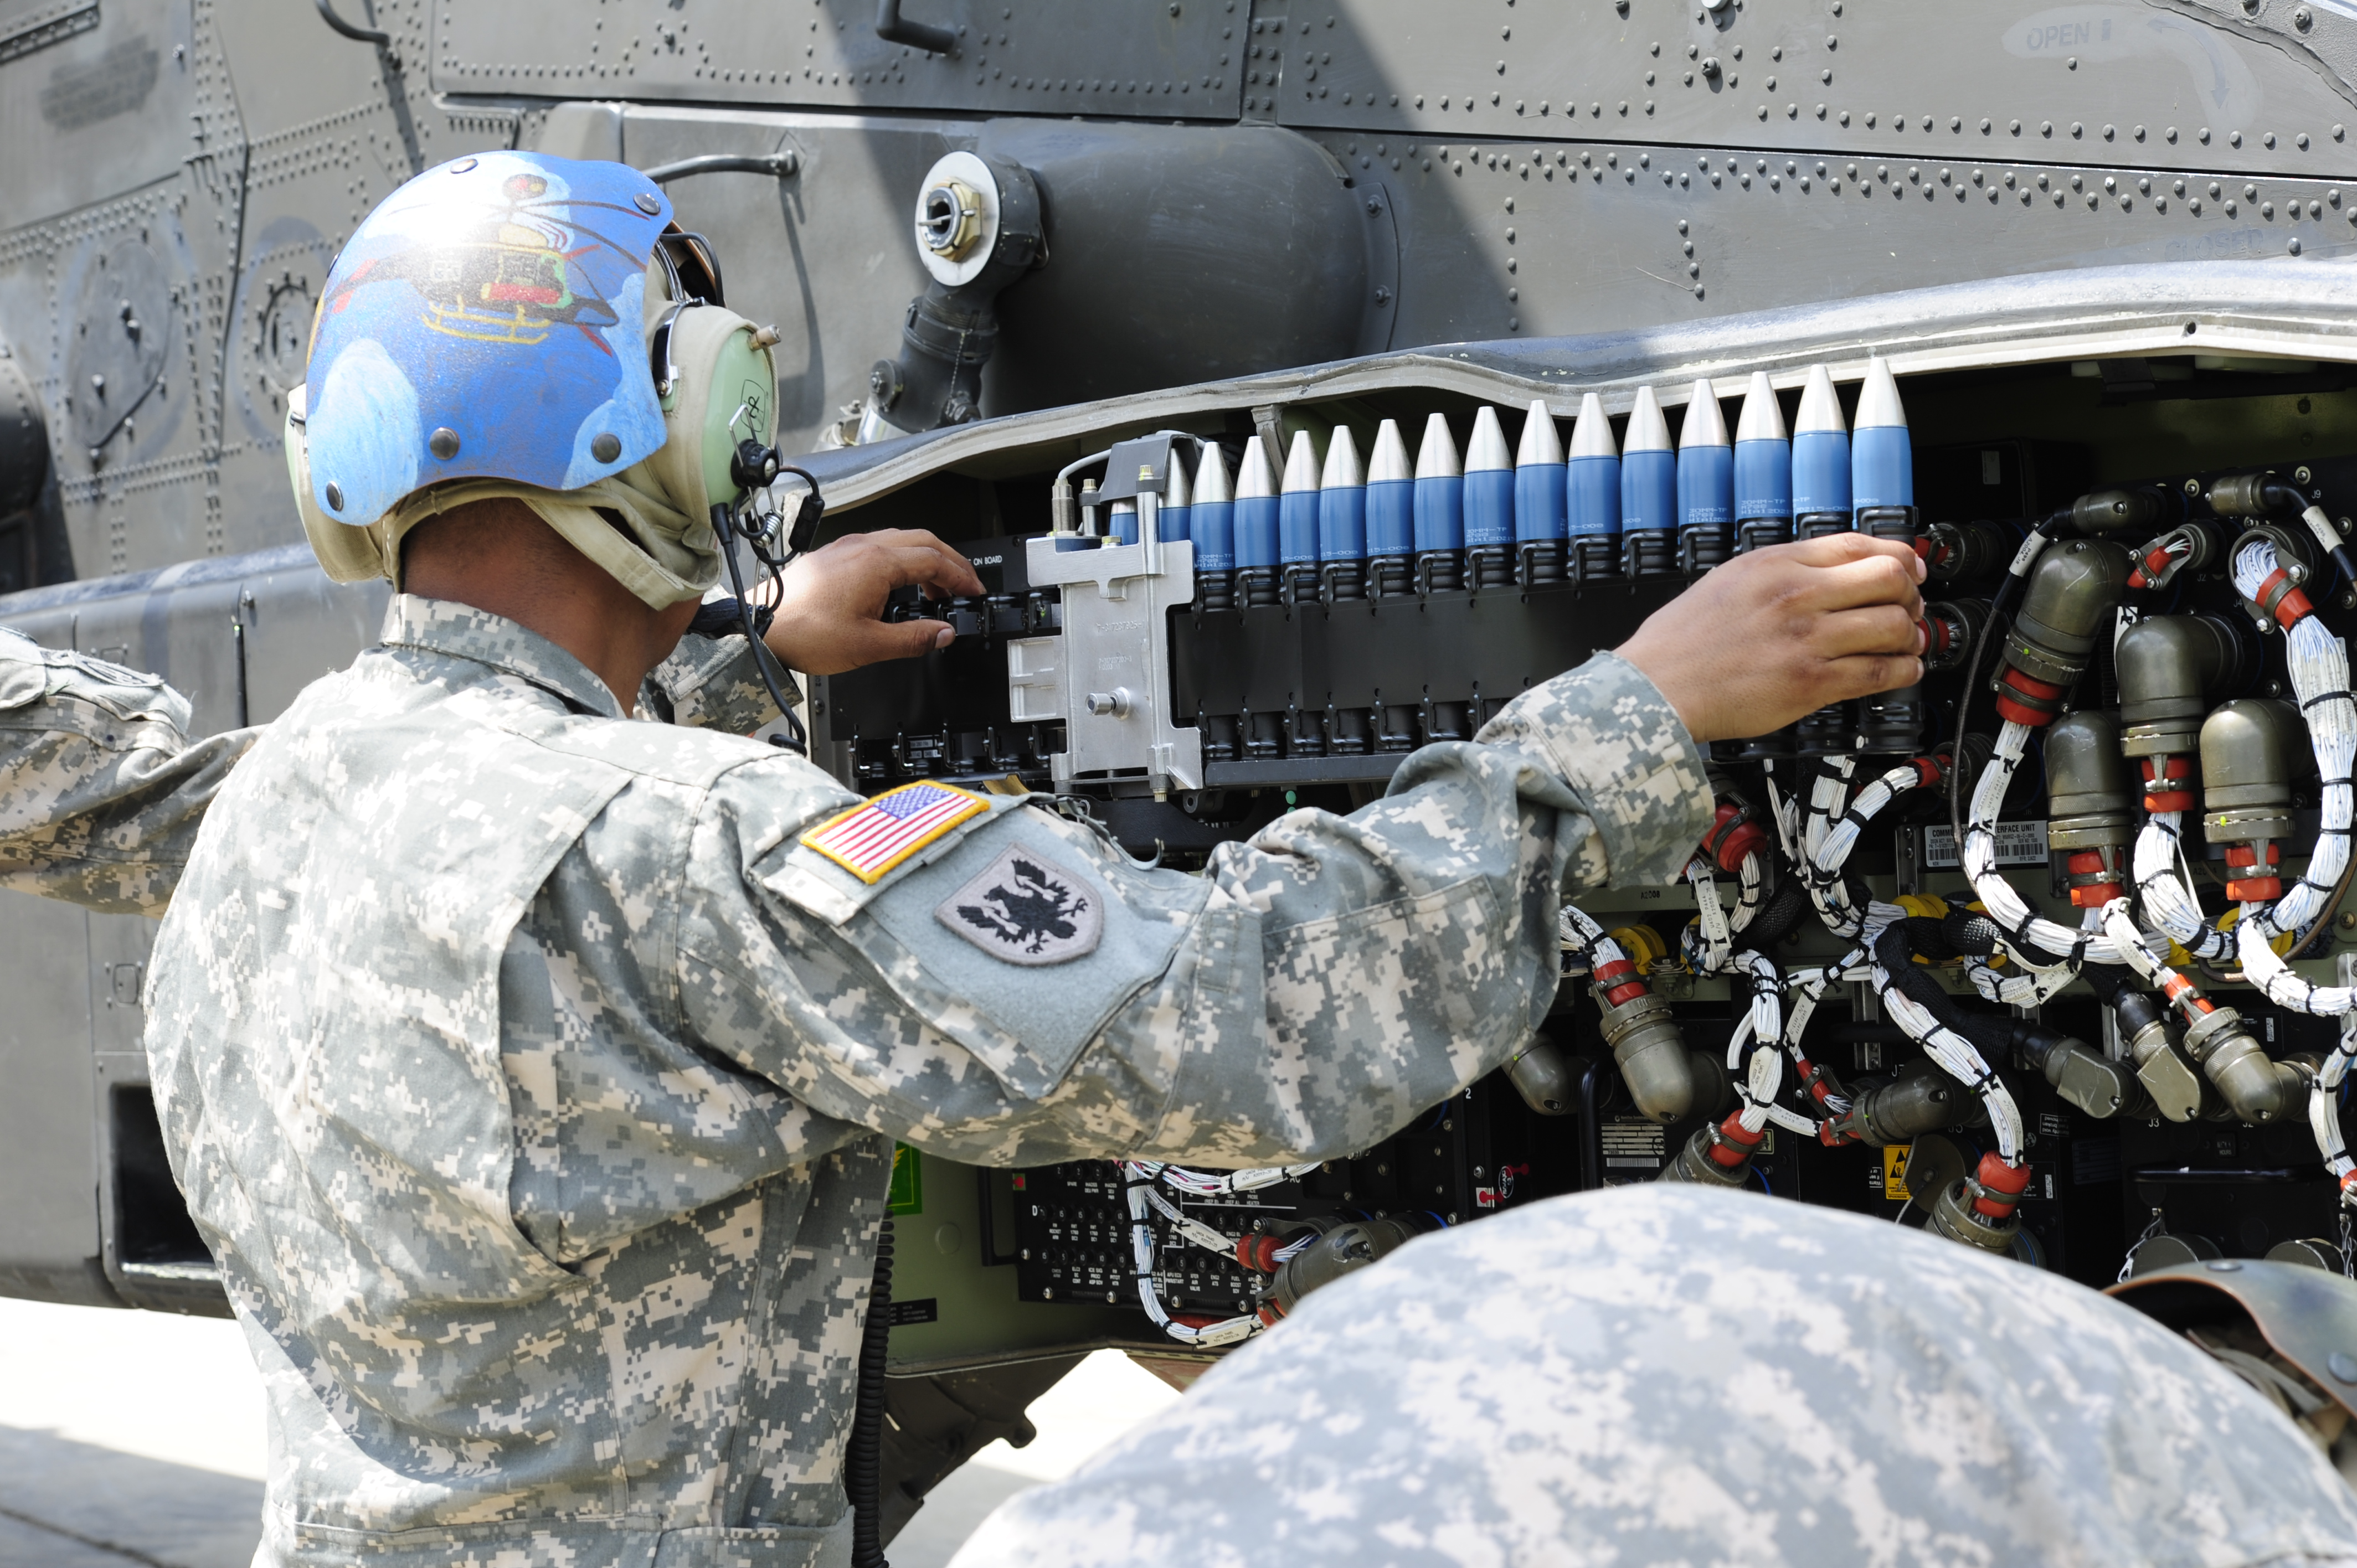 U.S._Army_Staff_Sgt._Douglas_Herrera,_a_